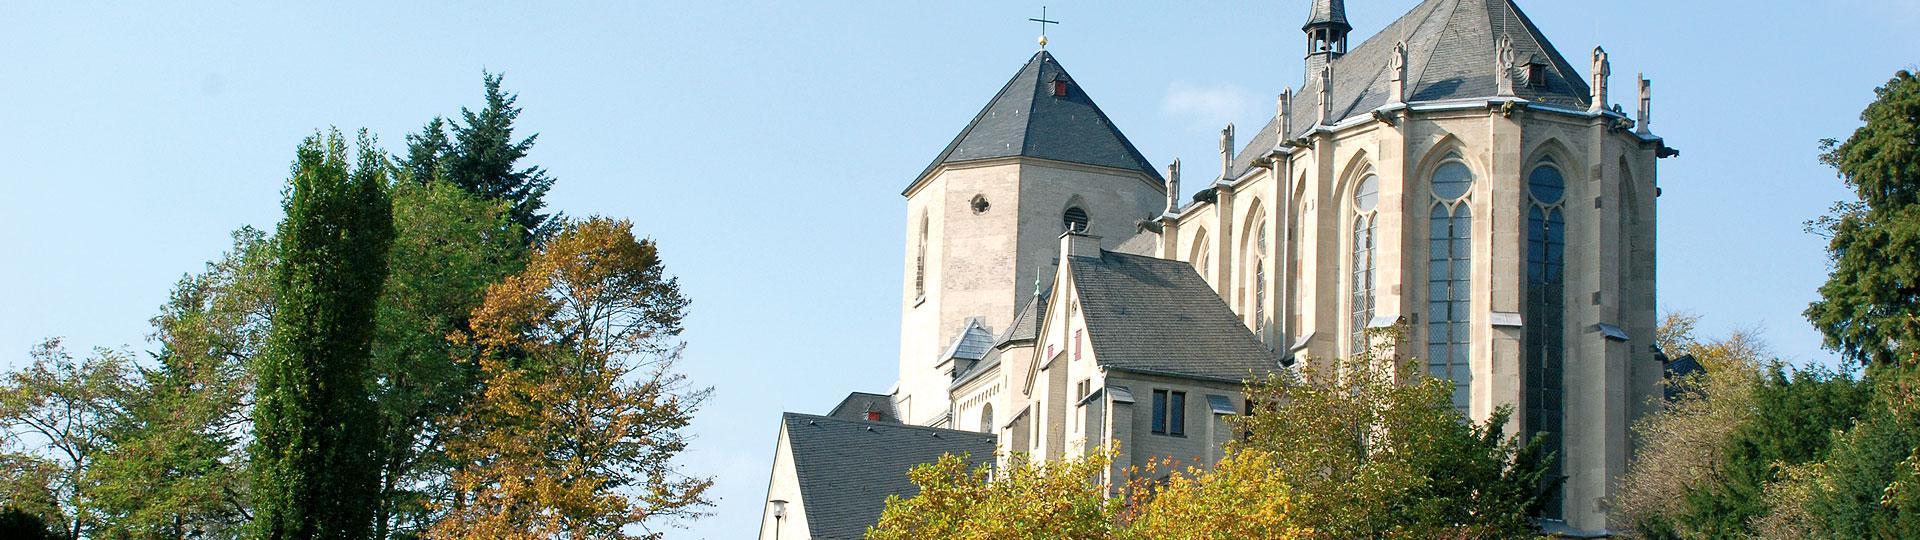 Foto Münster St. Vitus im Frühling